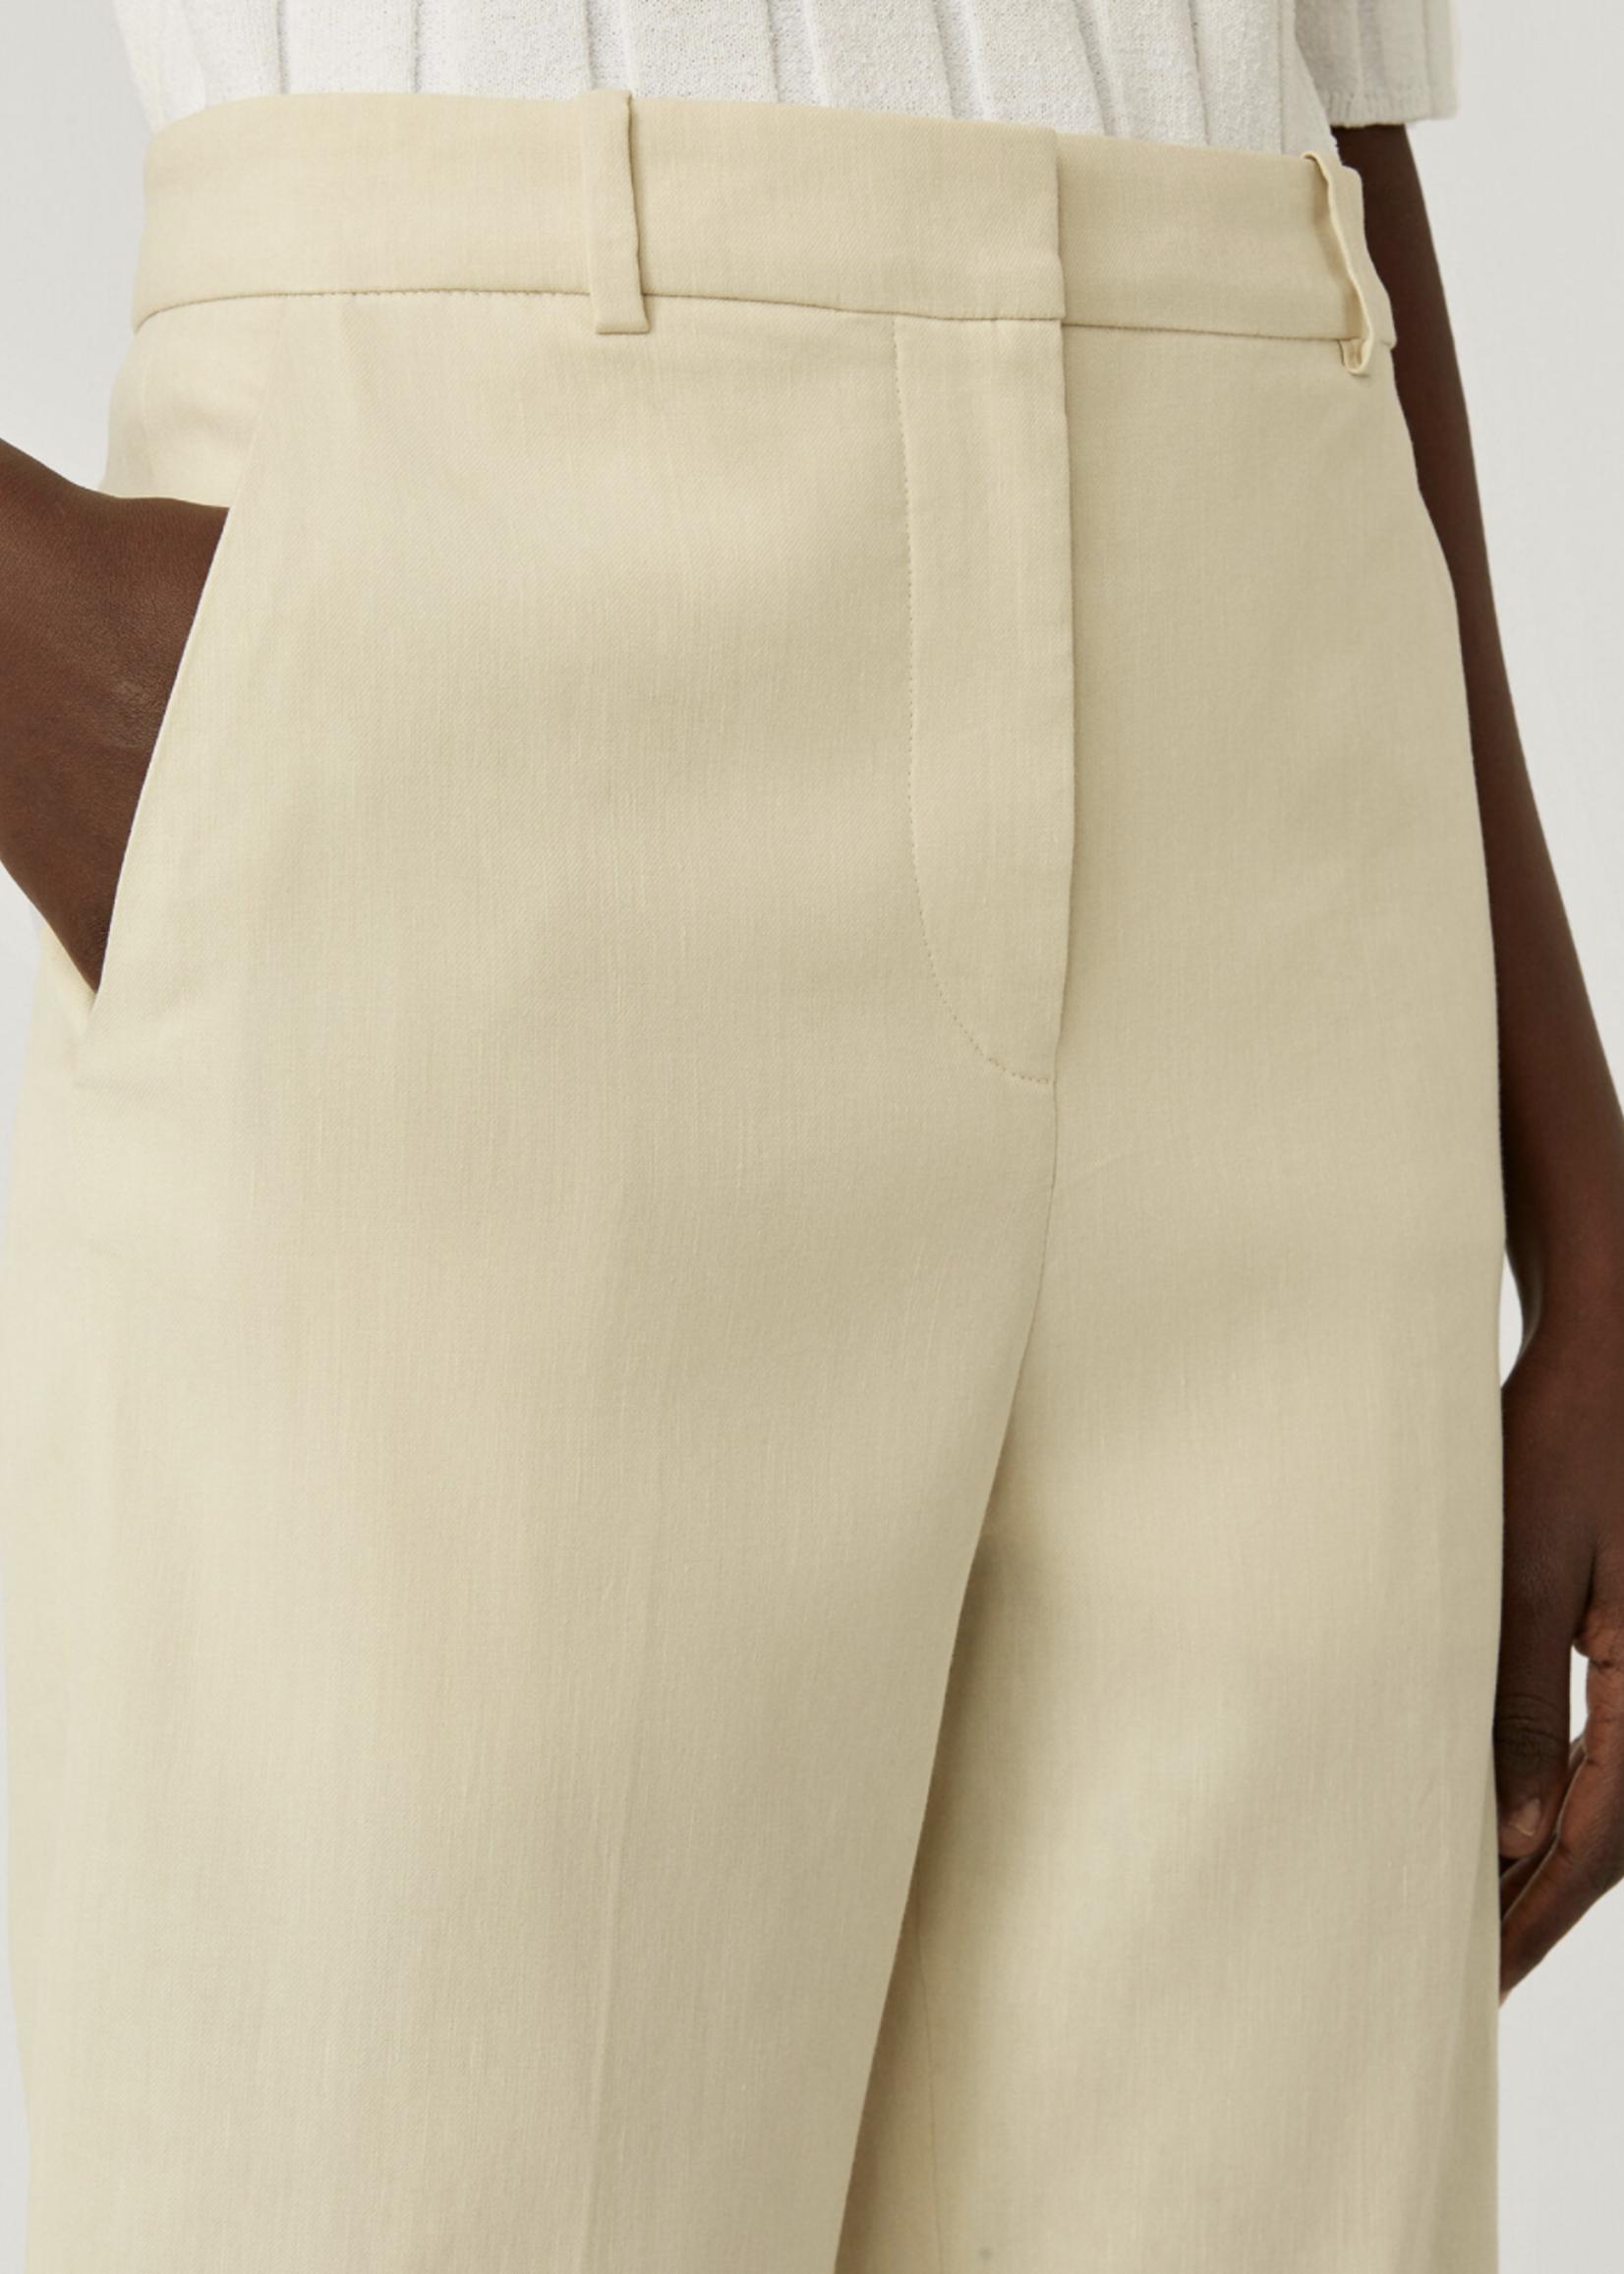 Joseph joseph trina strech linen cotton pants , oat